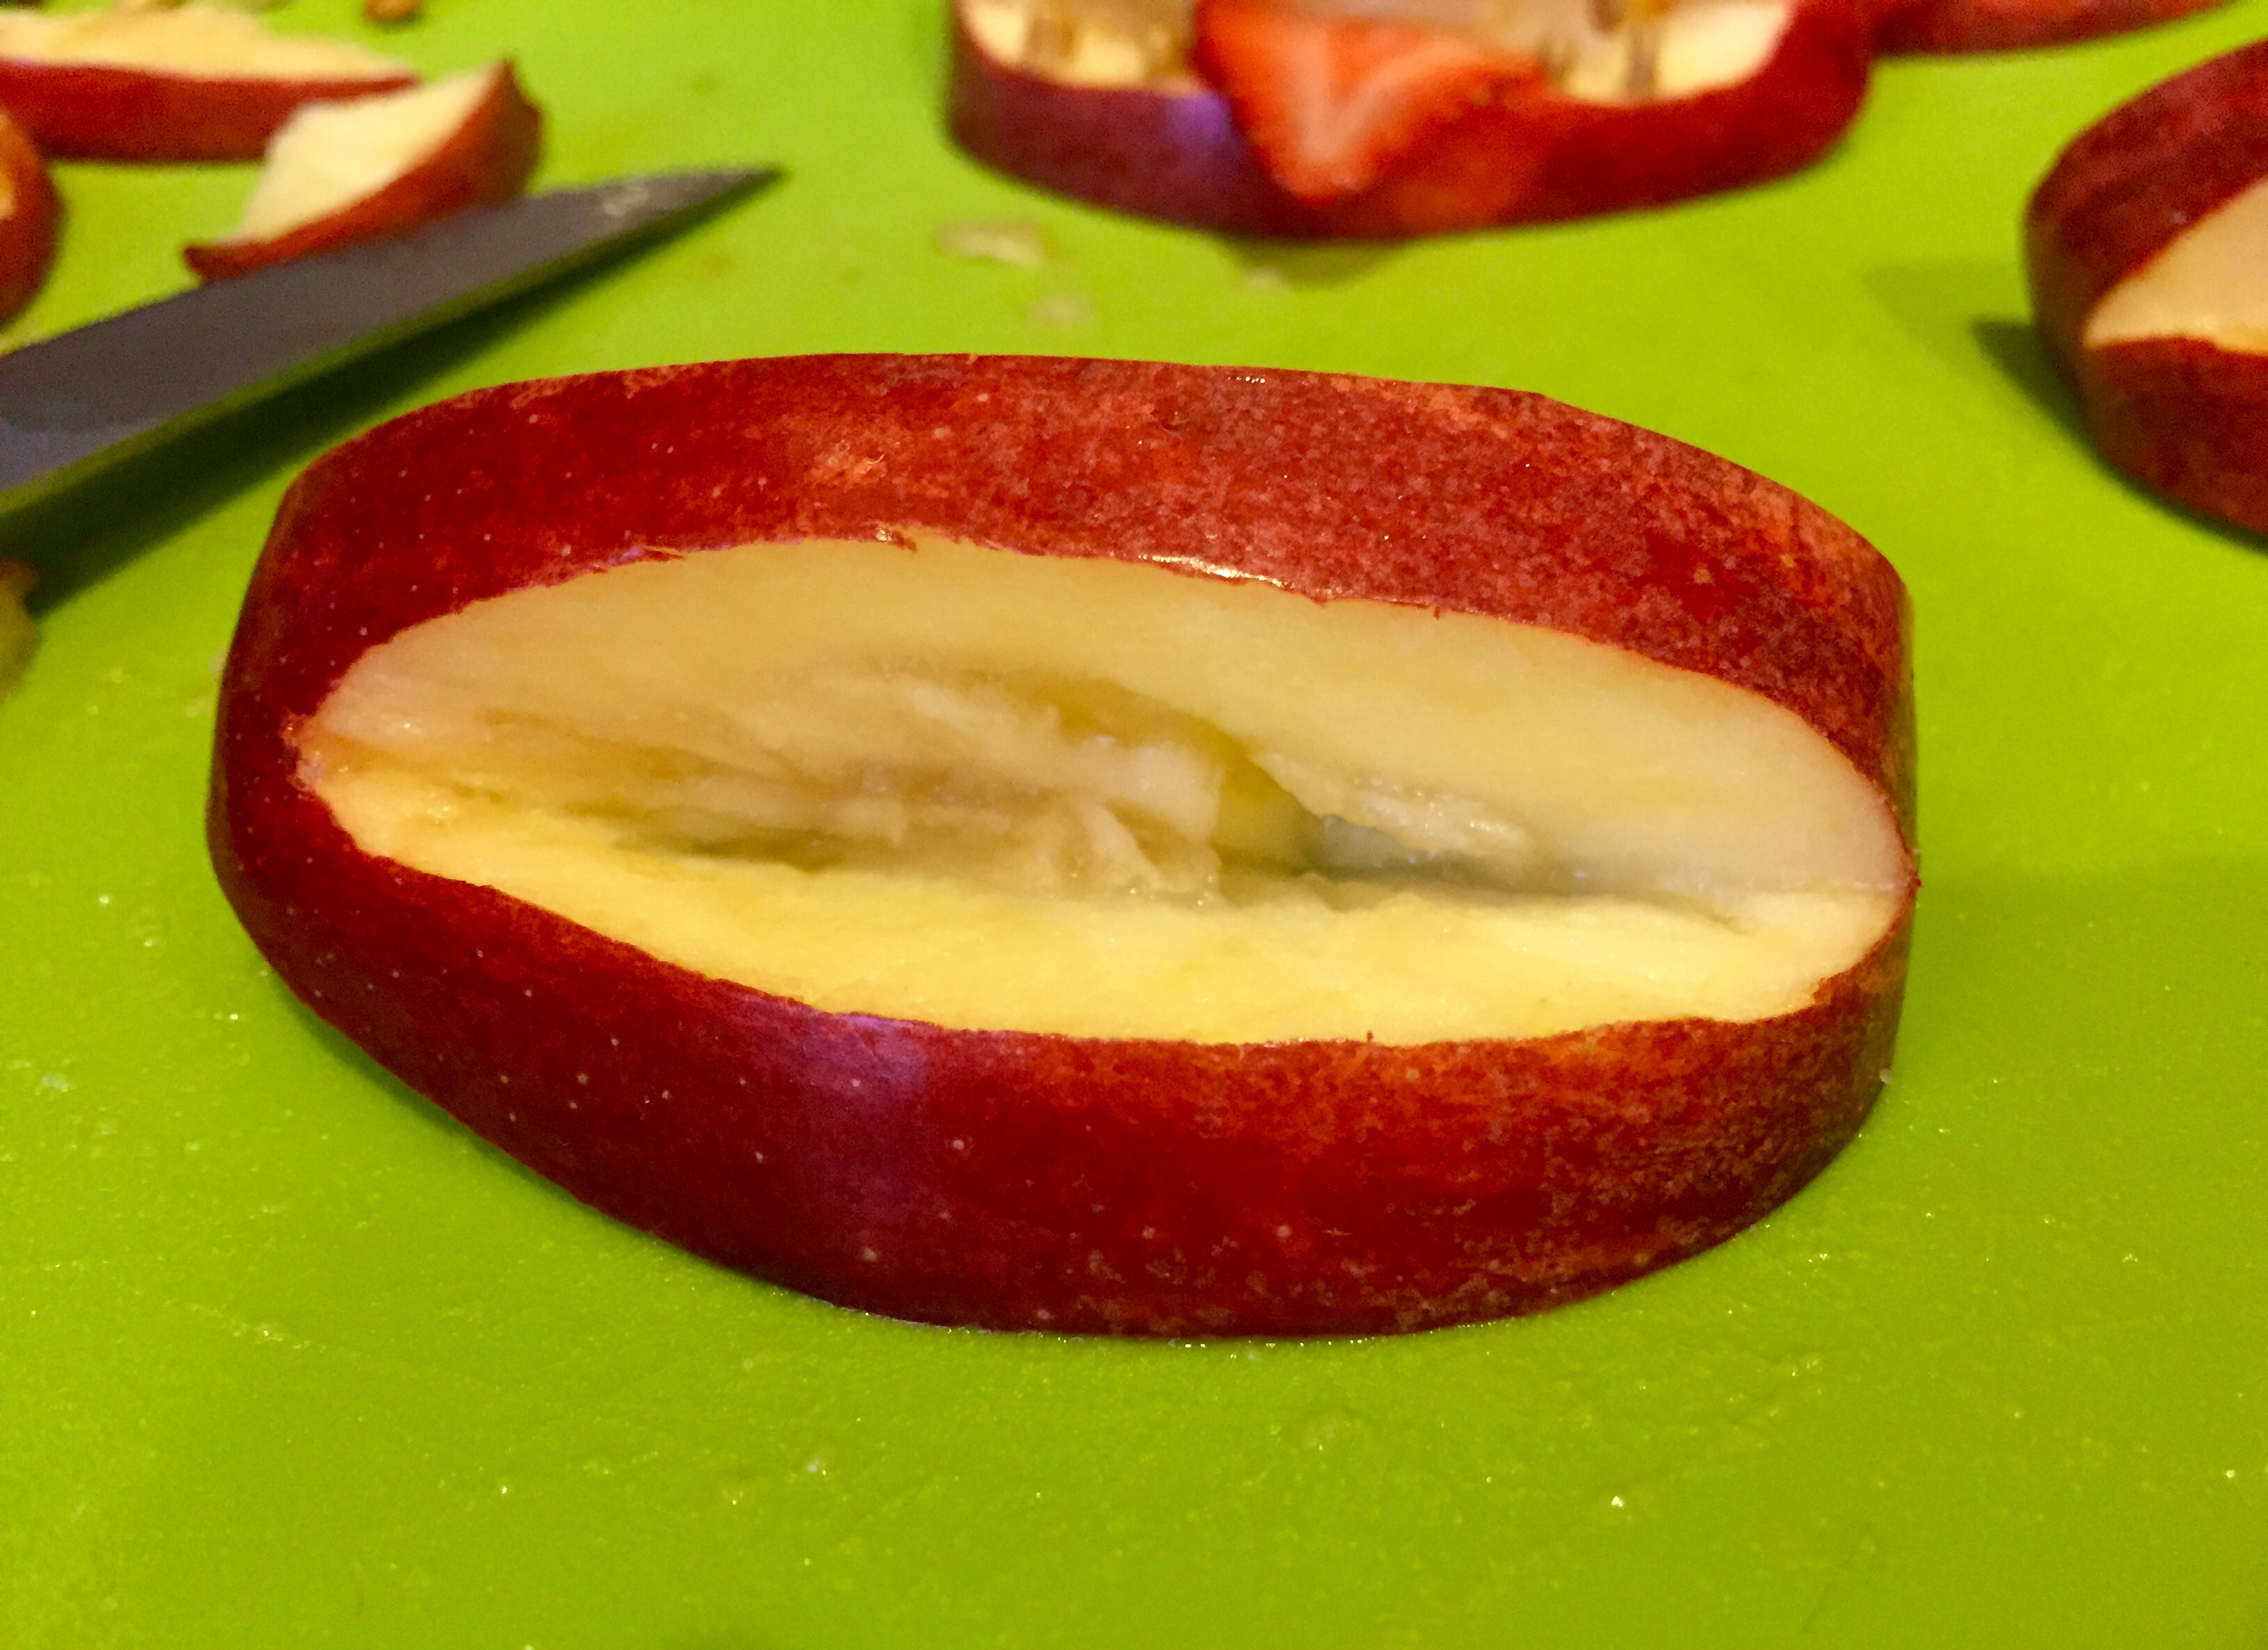 vampire-apple-bites-step-2